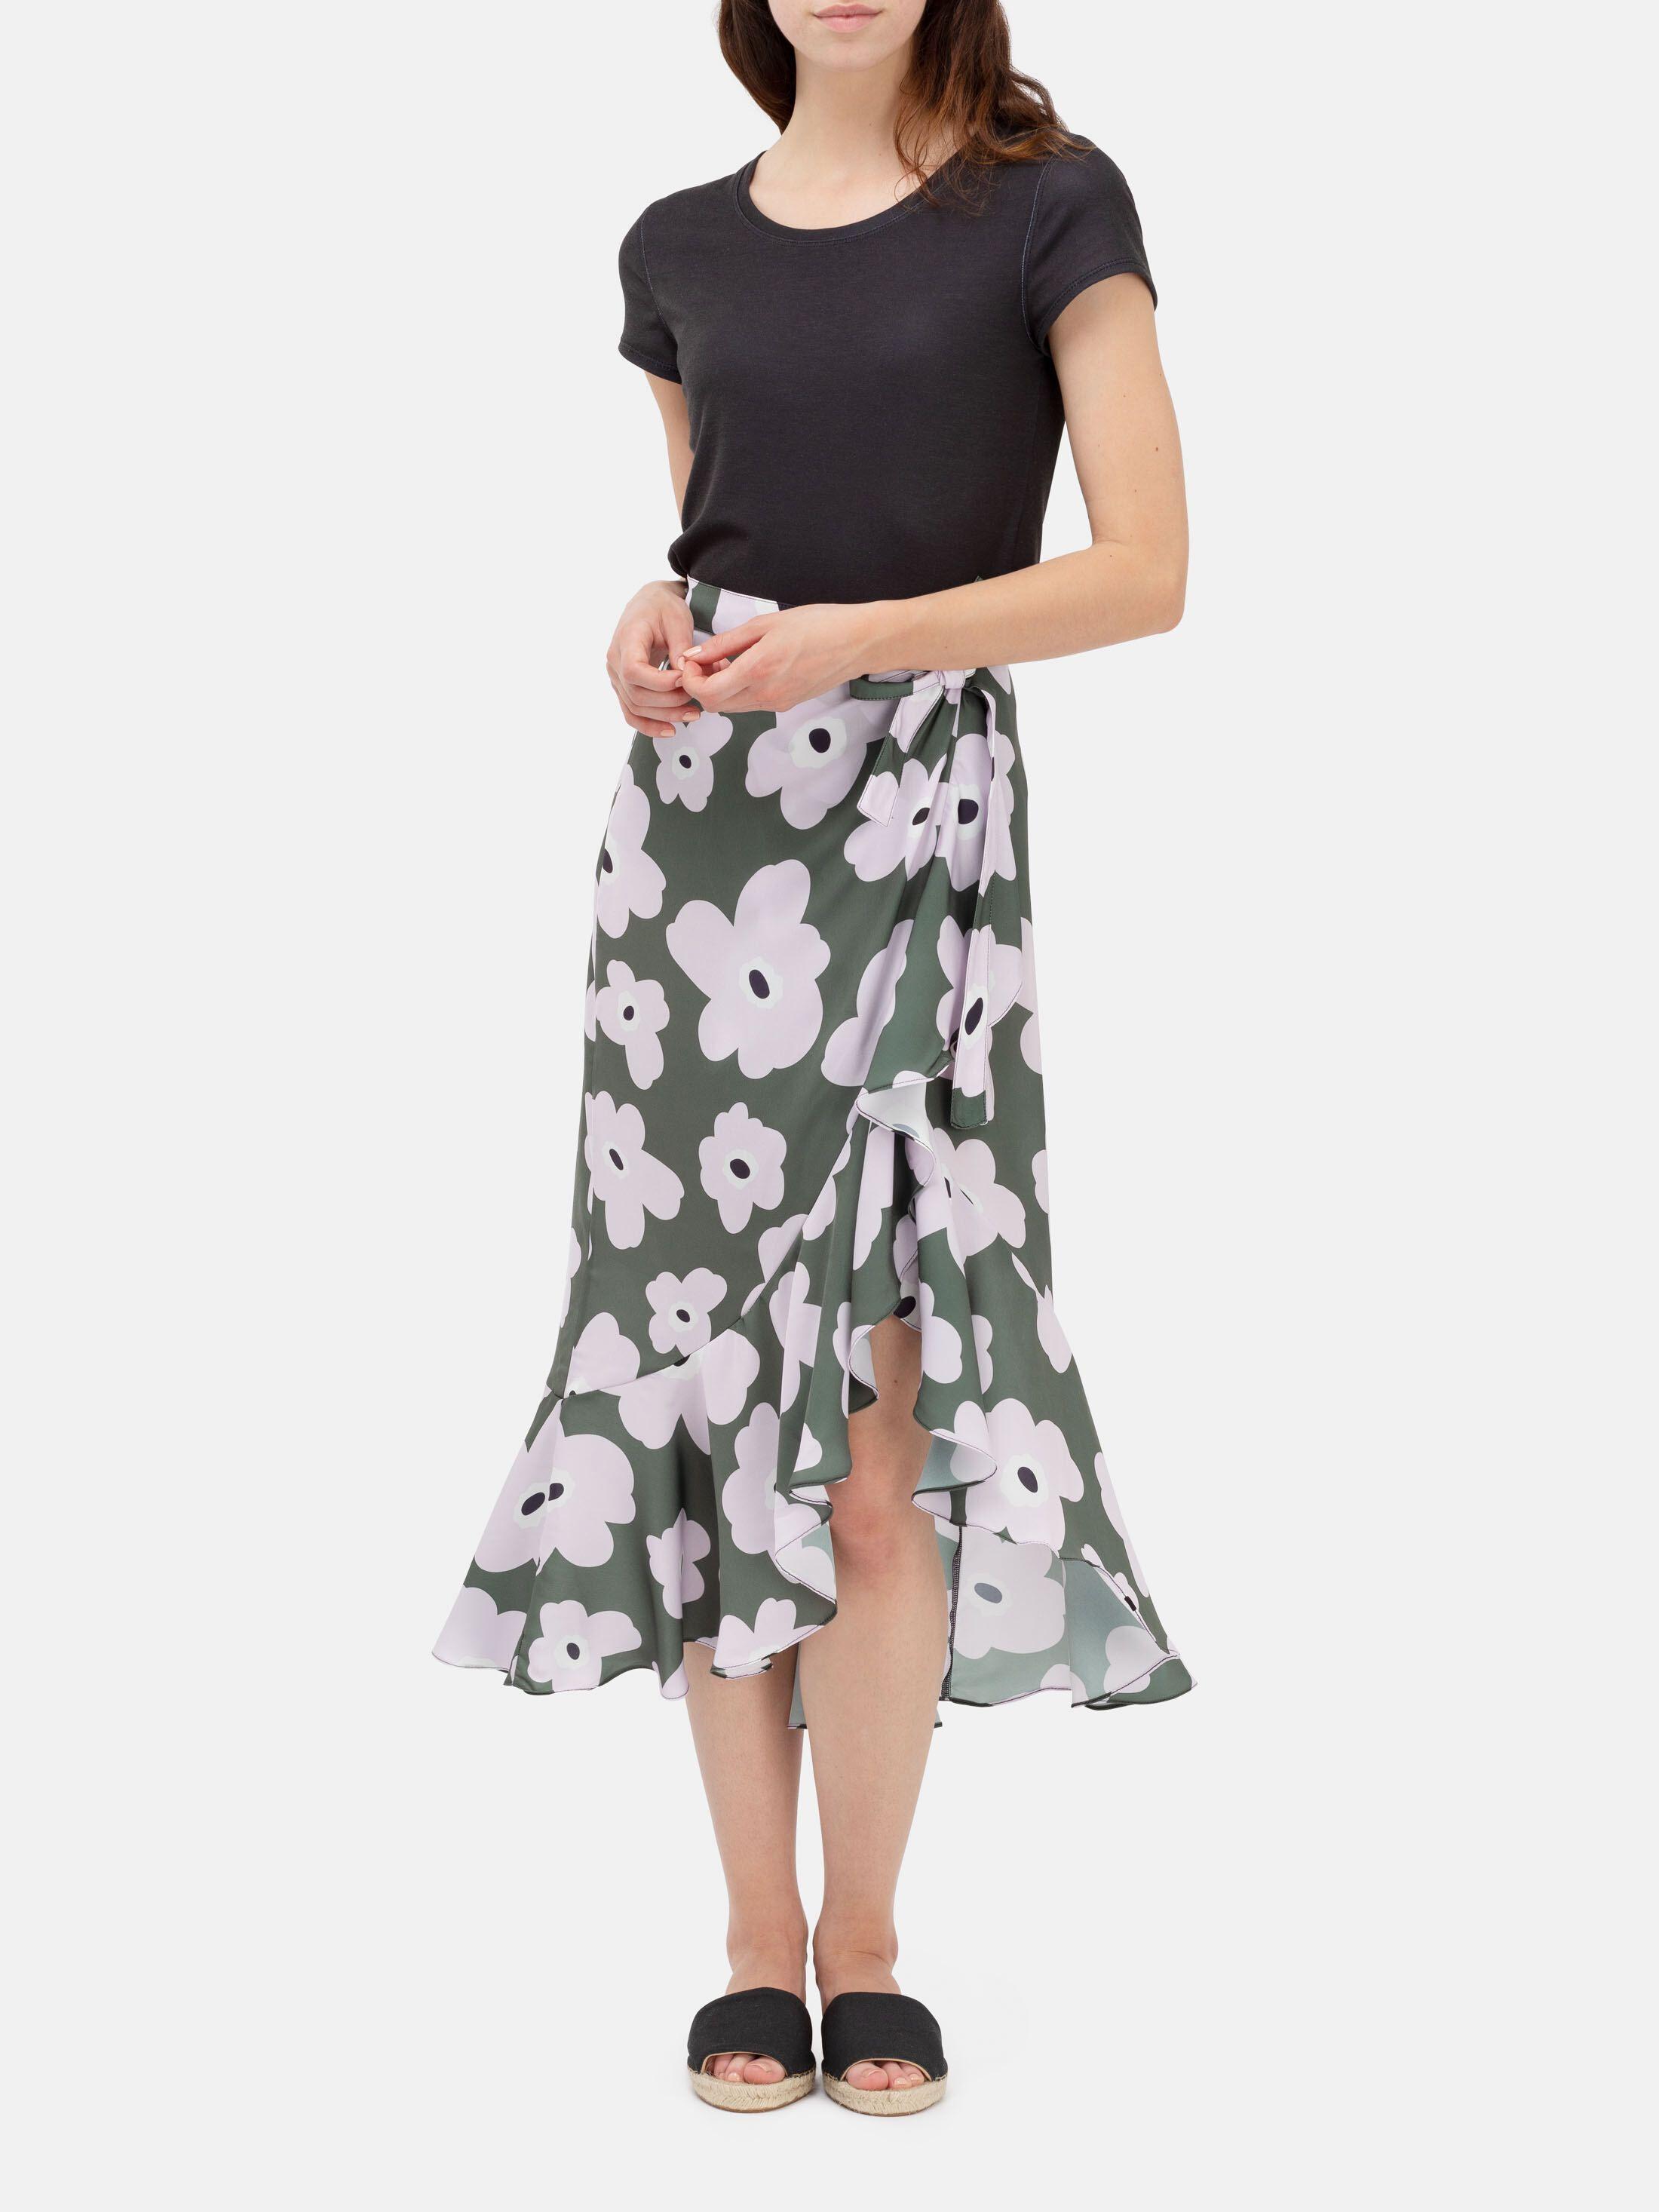 custom printed flounce skirt details